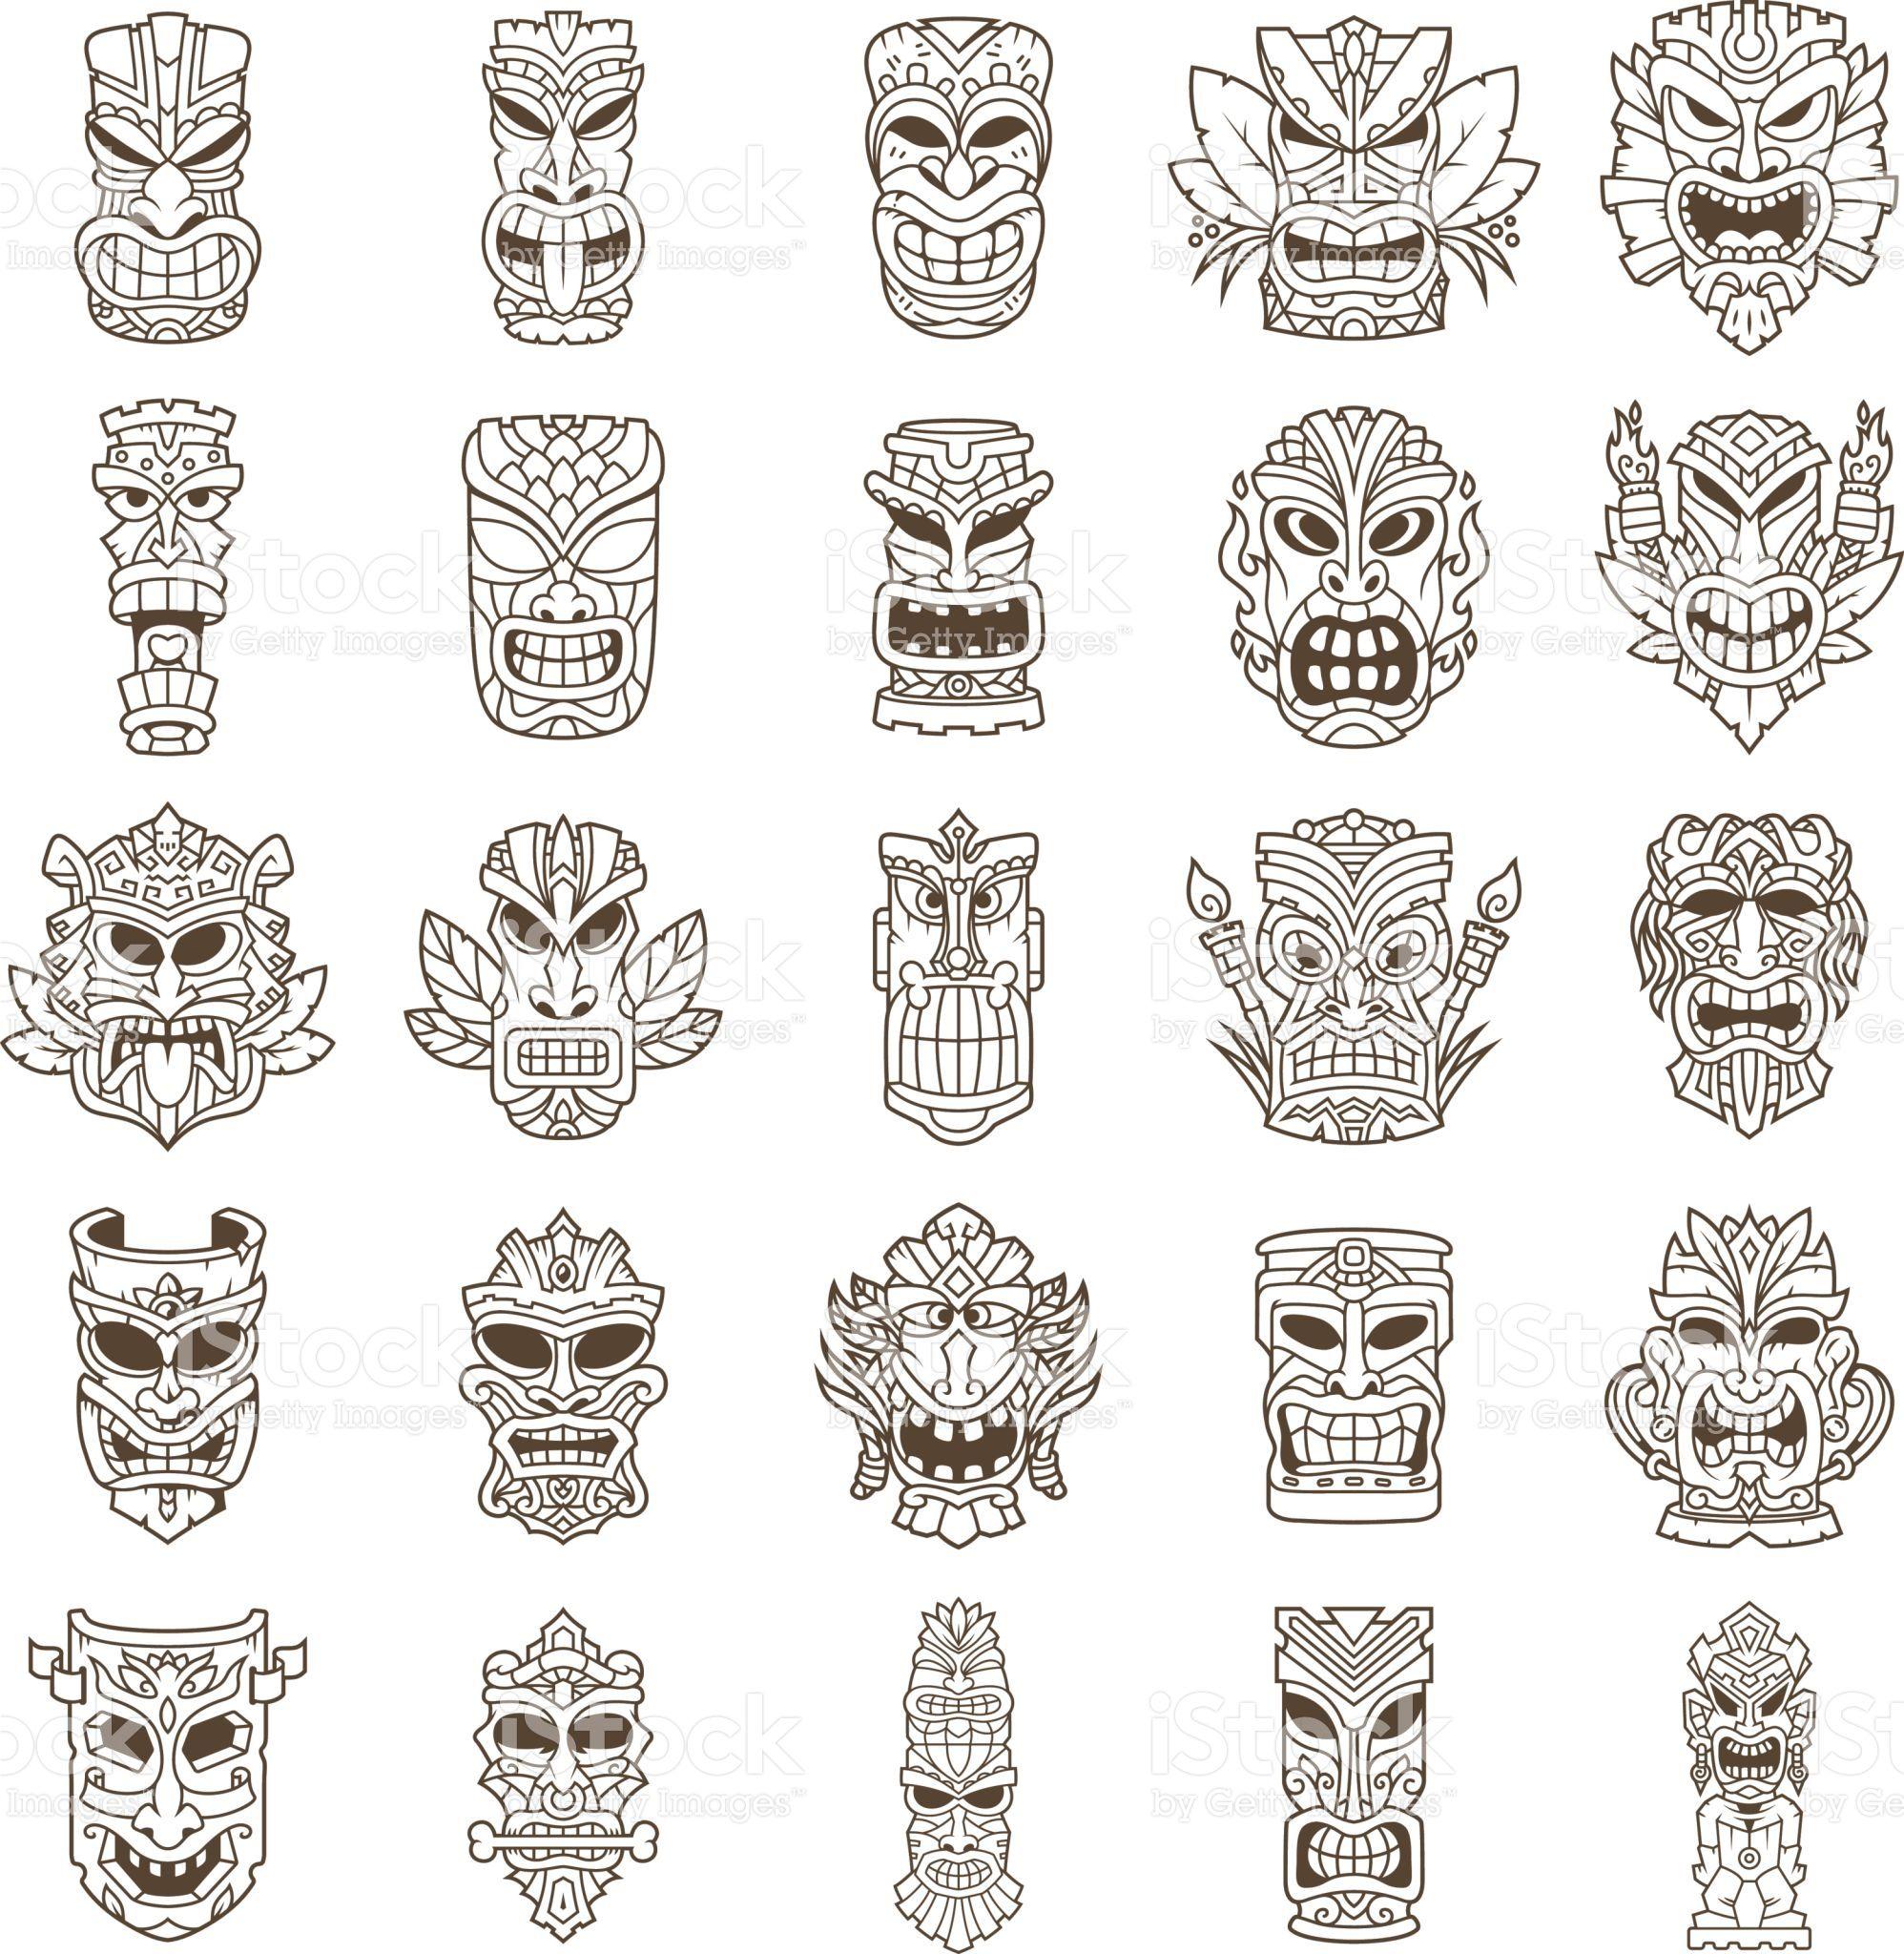 Tiki Head Line Art Set Tiki head, Tiki art, Tiki tattoo